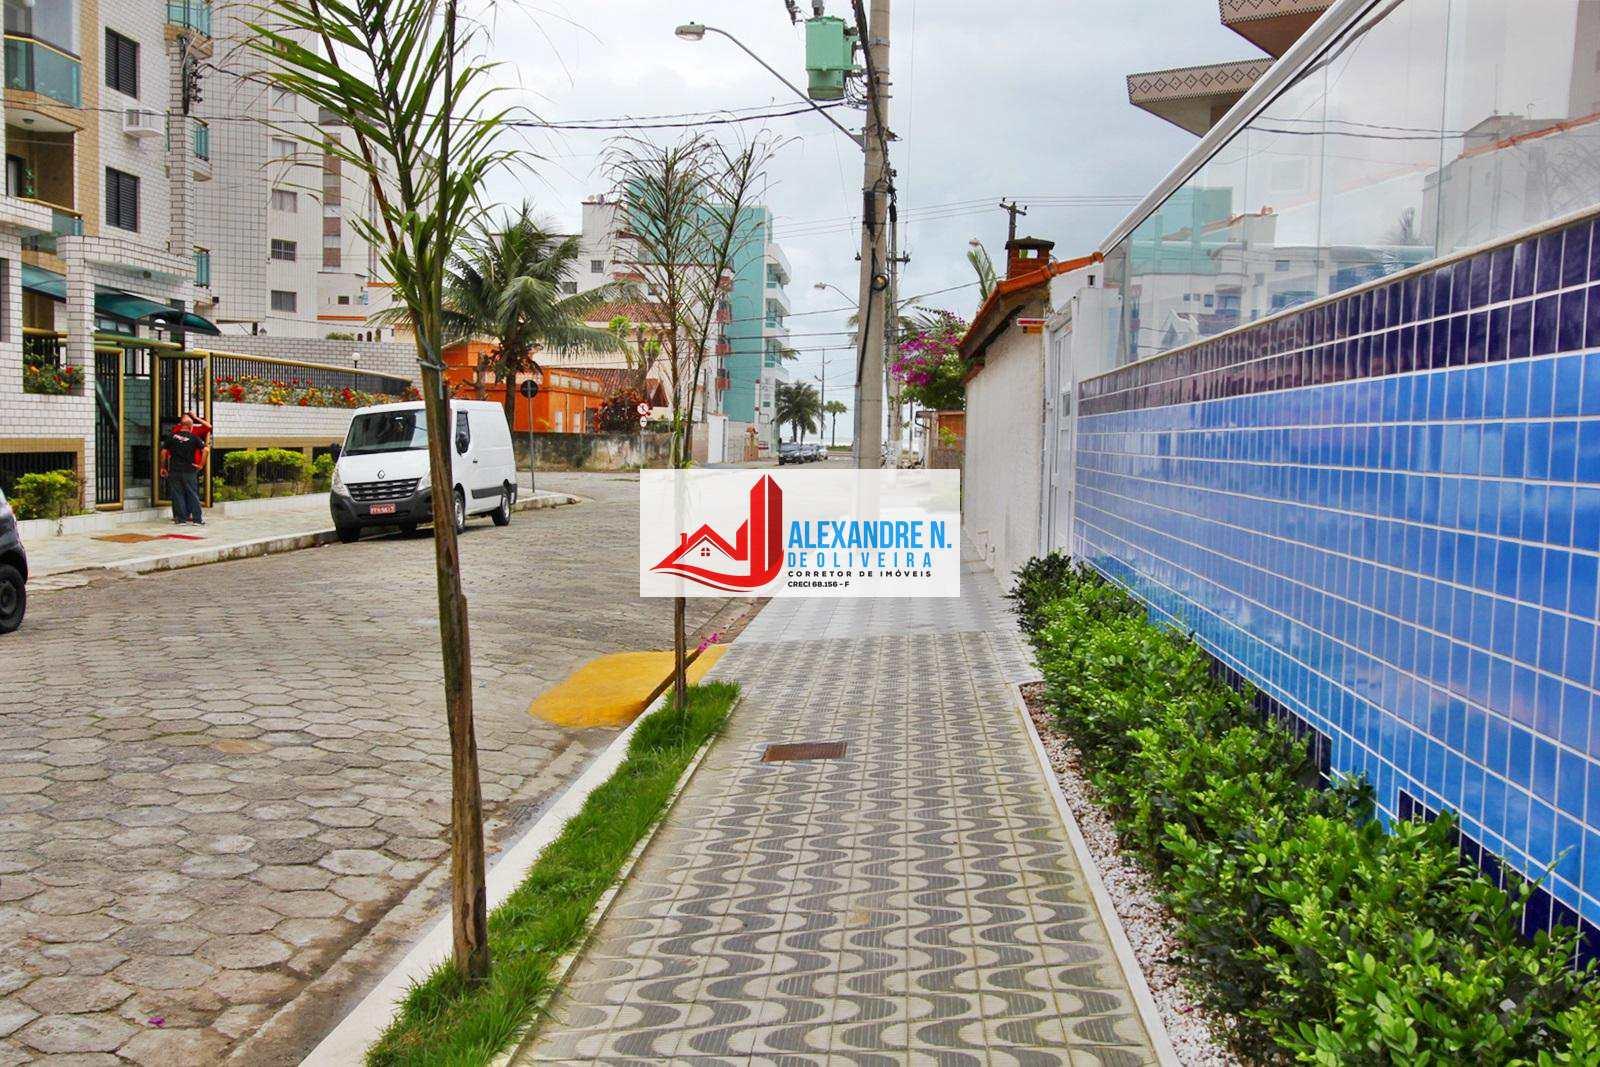 Apartamento 2 dorms, Ocian, Praia Grande, R$ 311 mil, AP00515.